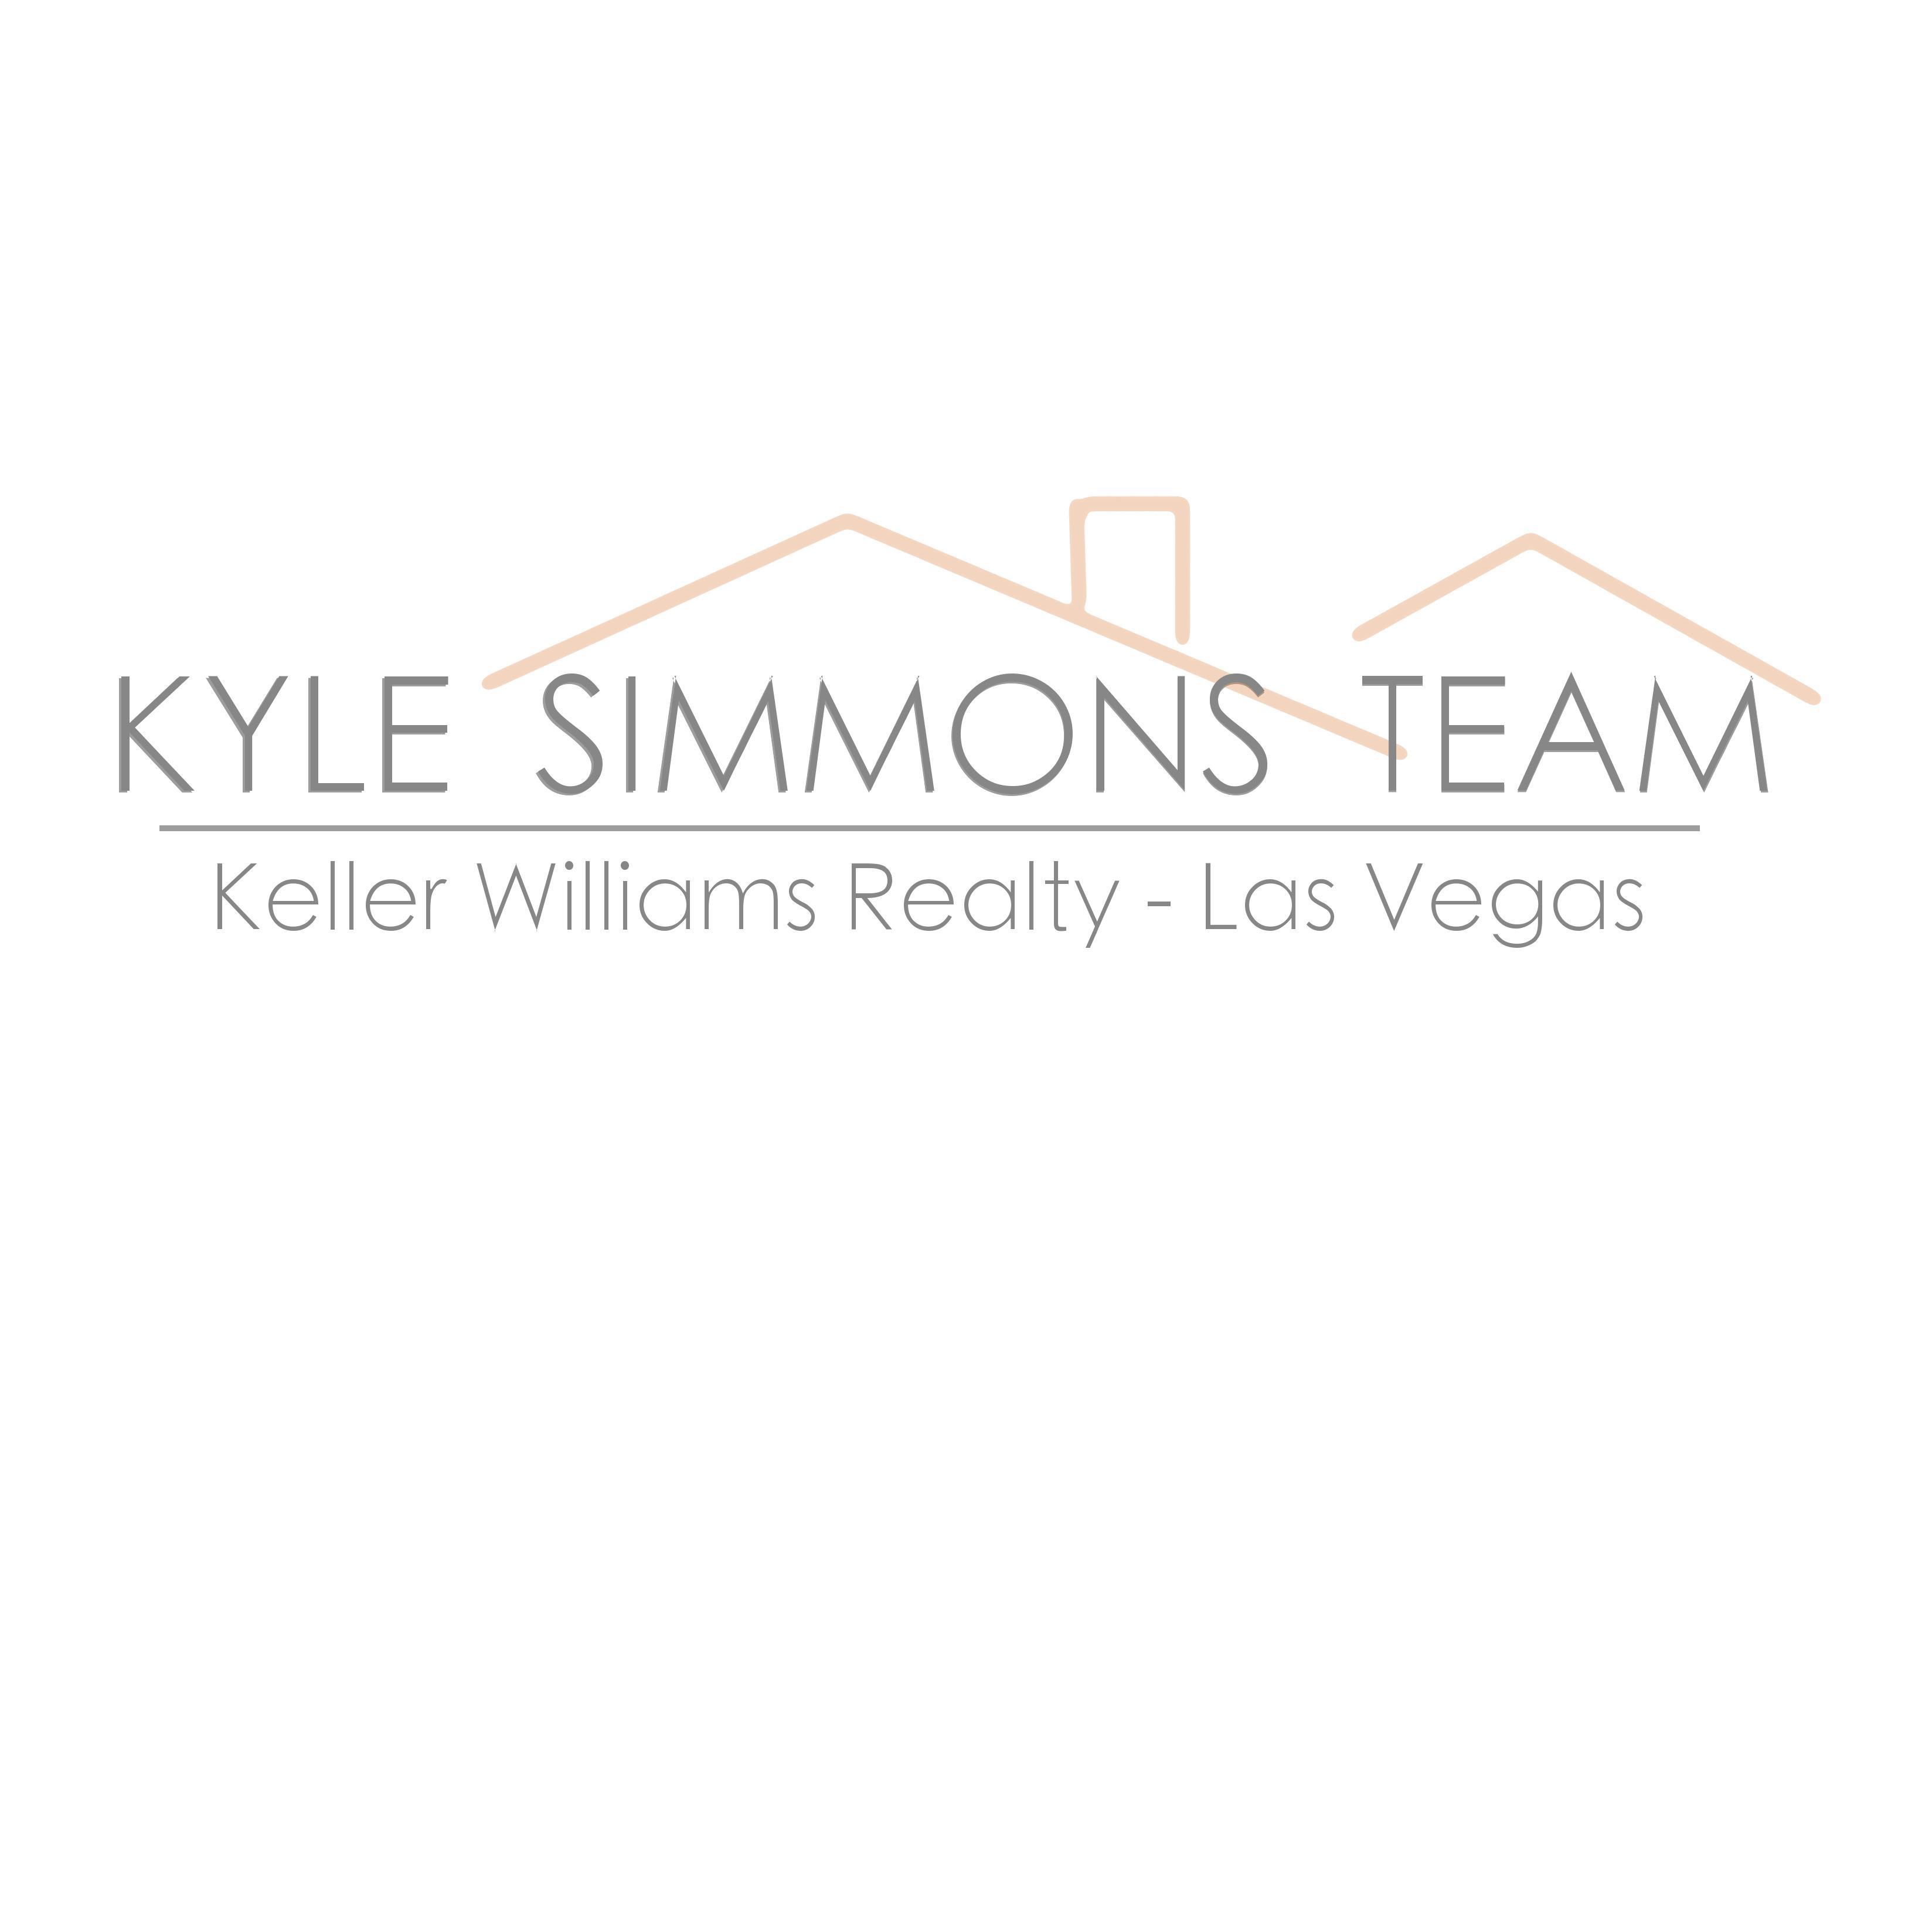 Kyle Simmons Team - Keller Williams Real Estate Las Vegas